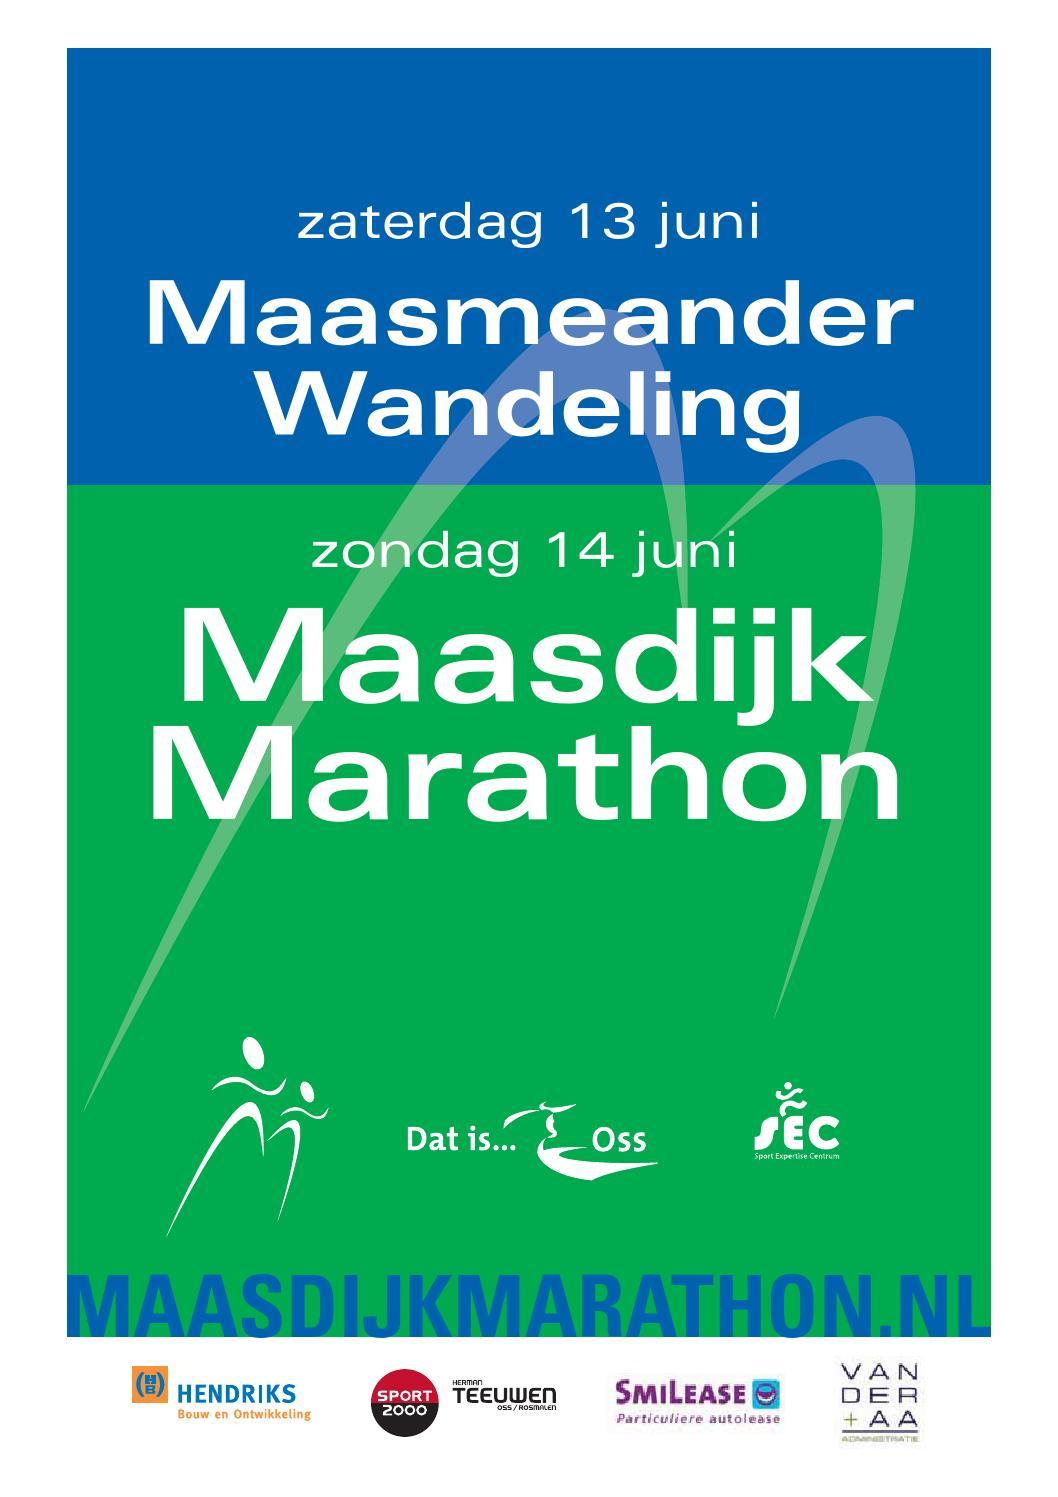 Maasdijk Marathon Week 24 2015 By Uitgeverij Talvi Issuu